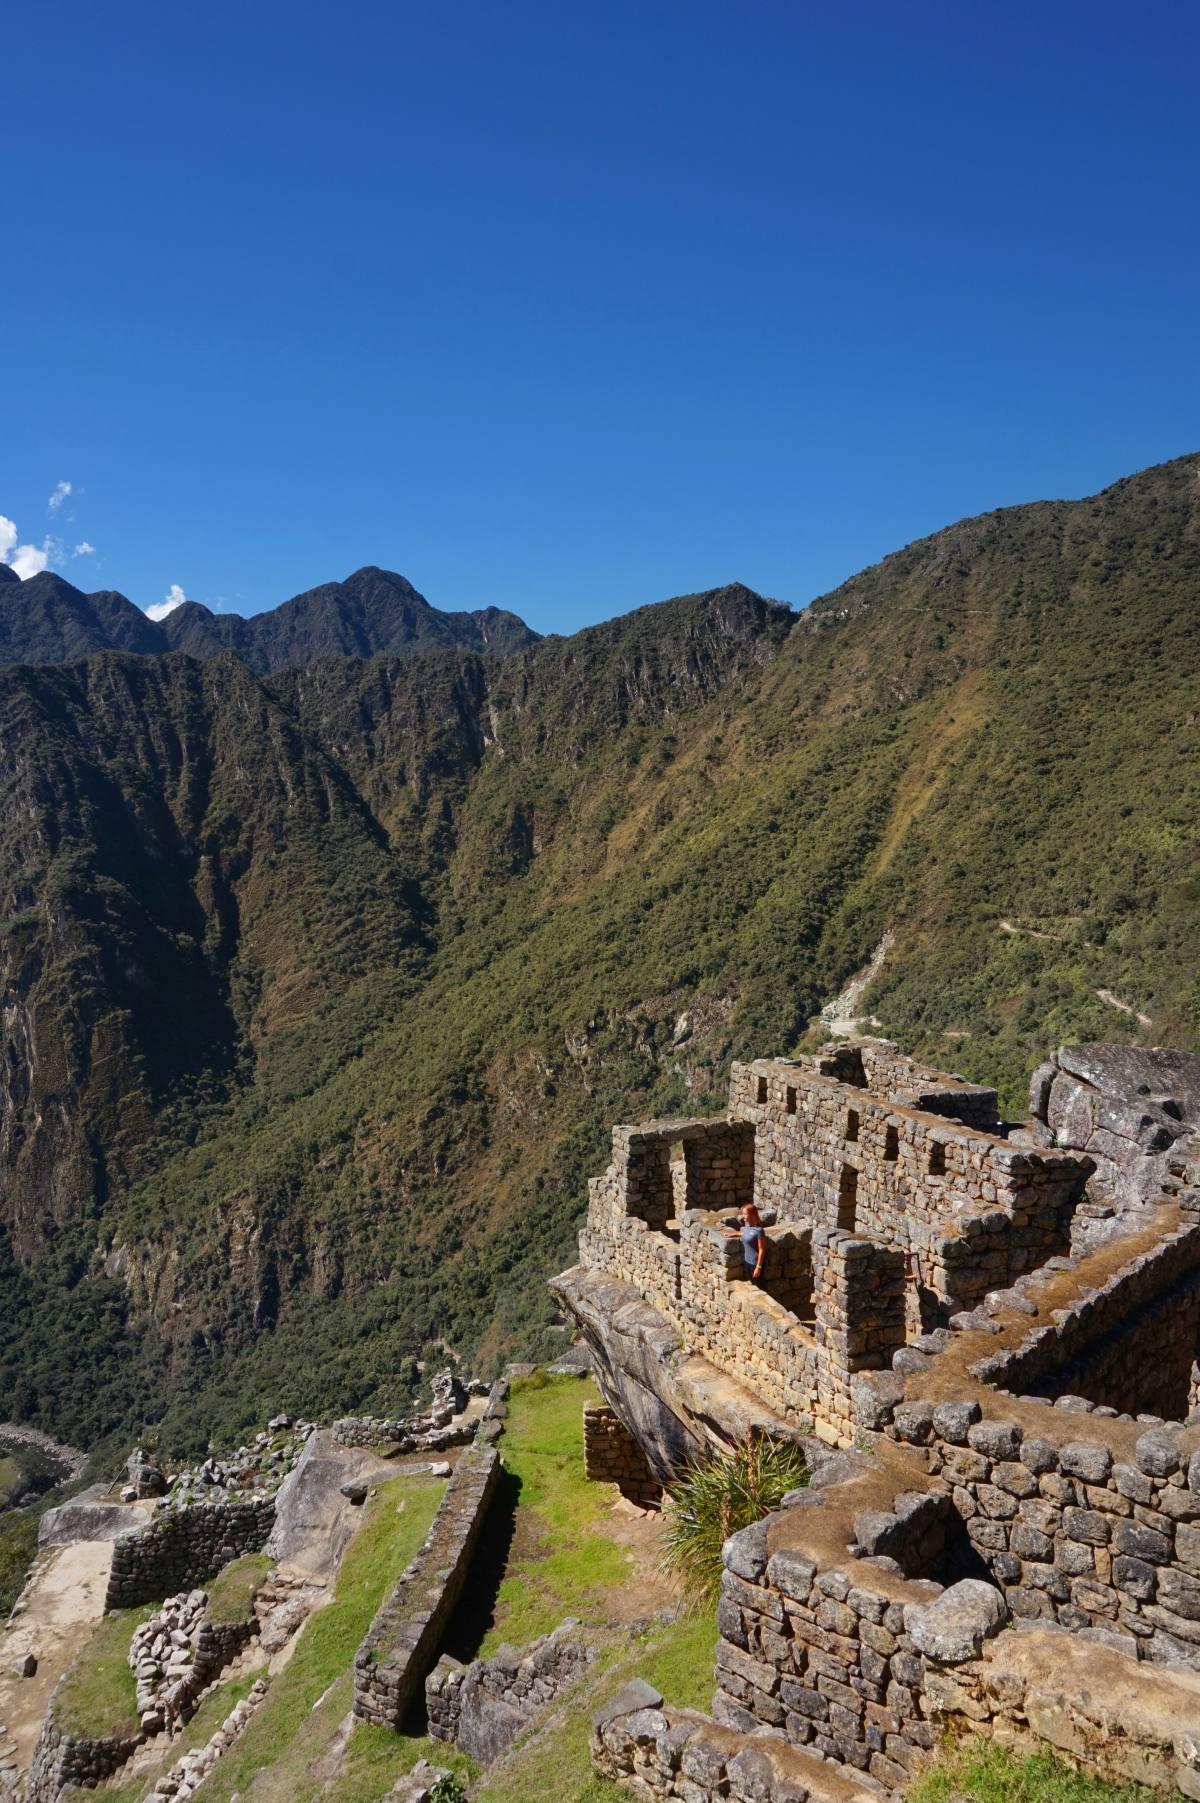 Best Times to Visit Machu Picchu